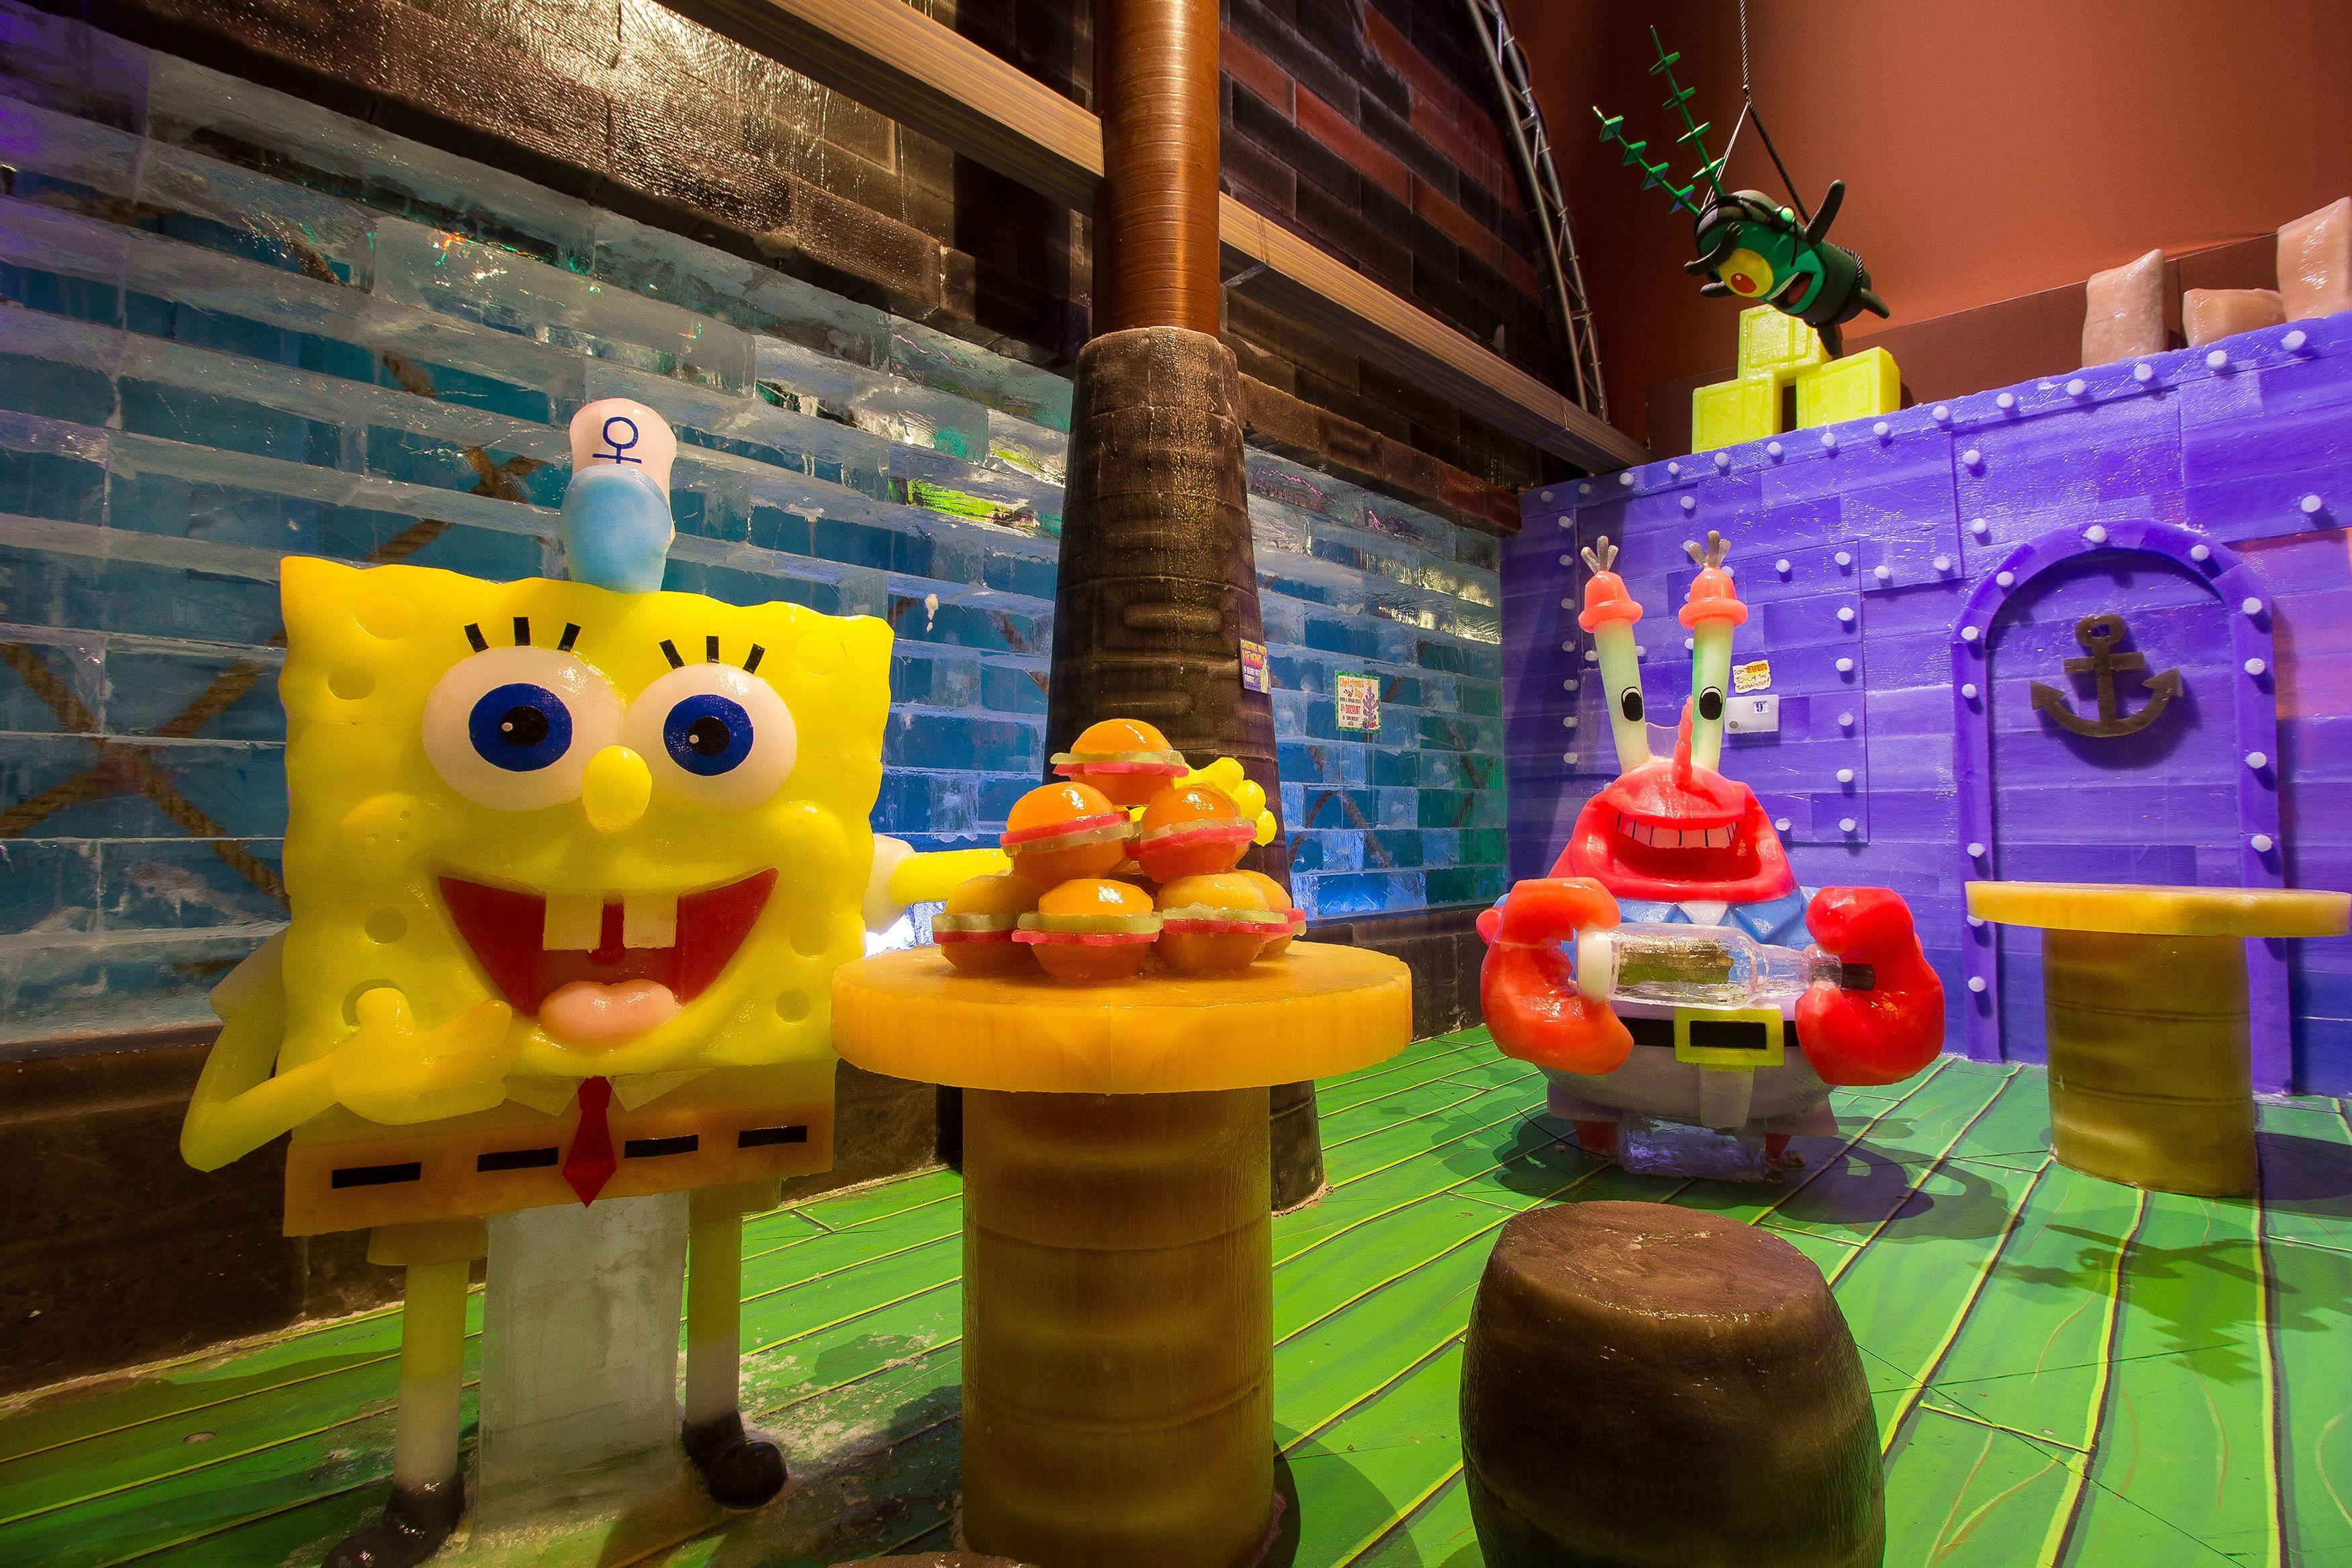 Lego spongebob krusty krab inside - 1530.1KB